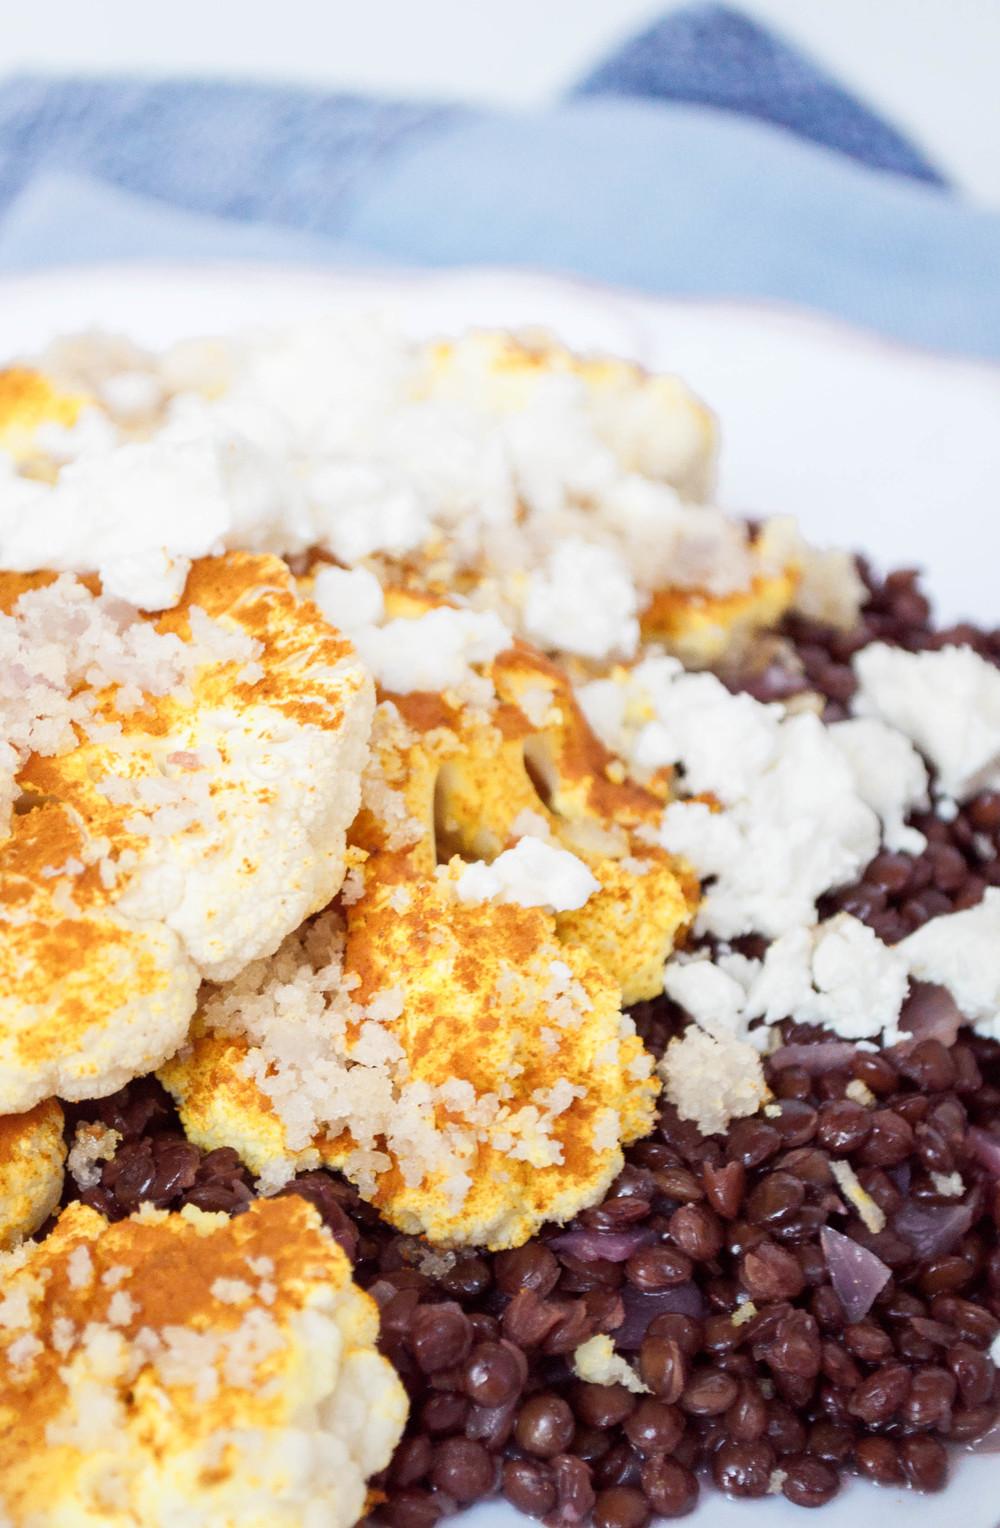 Turmeric and Panko Cauliflower with Black Lentils